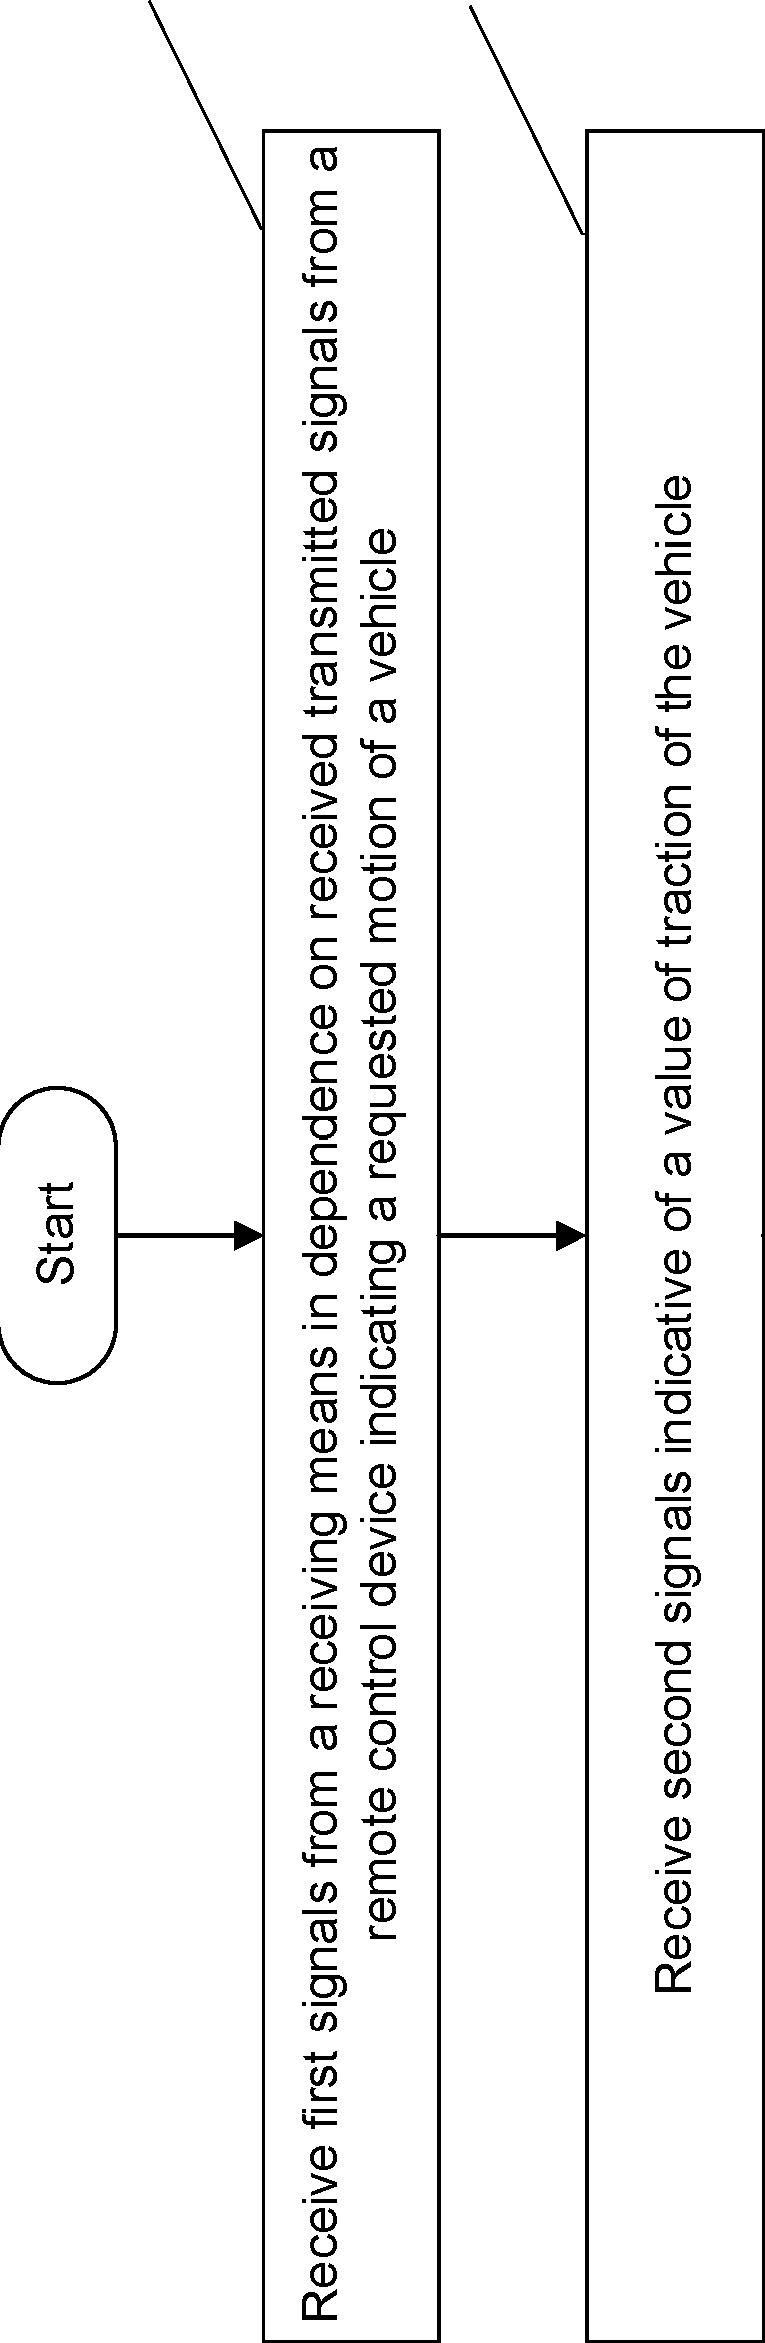 Figure GB2559168A_D0009